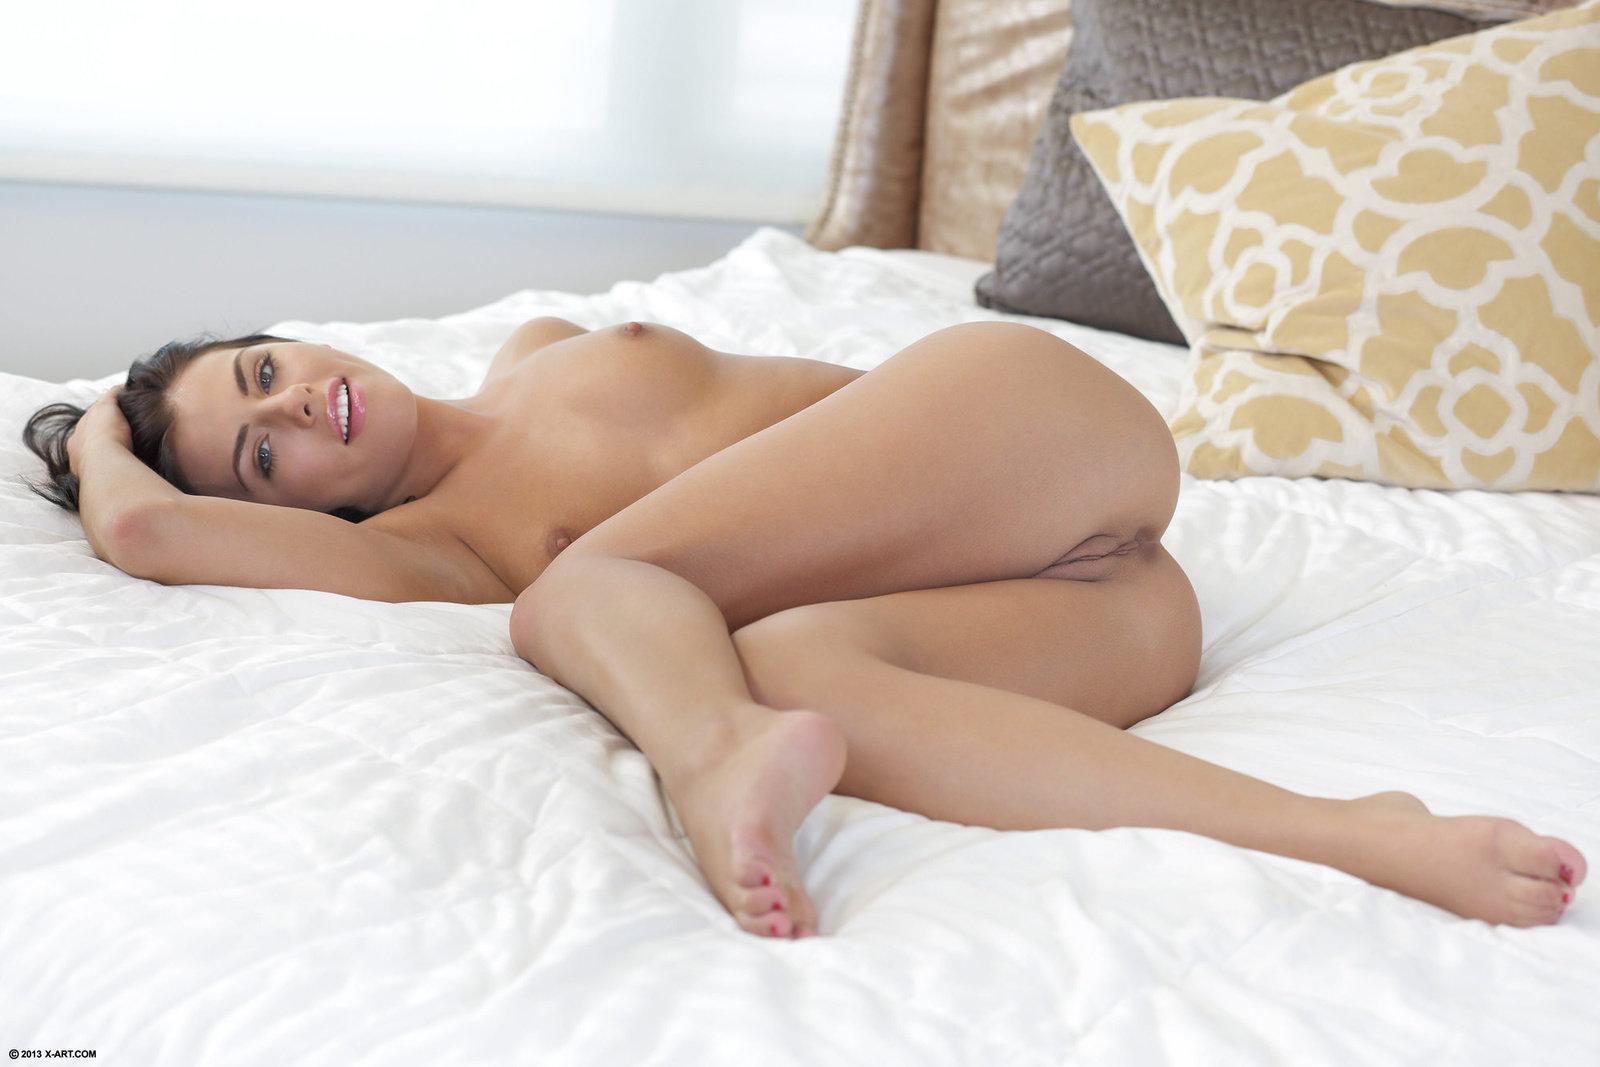 голые девушки ласкают свое тело фото дома на кровати моё